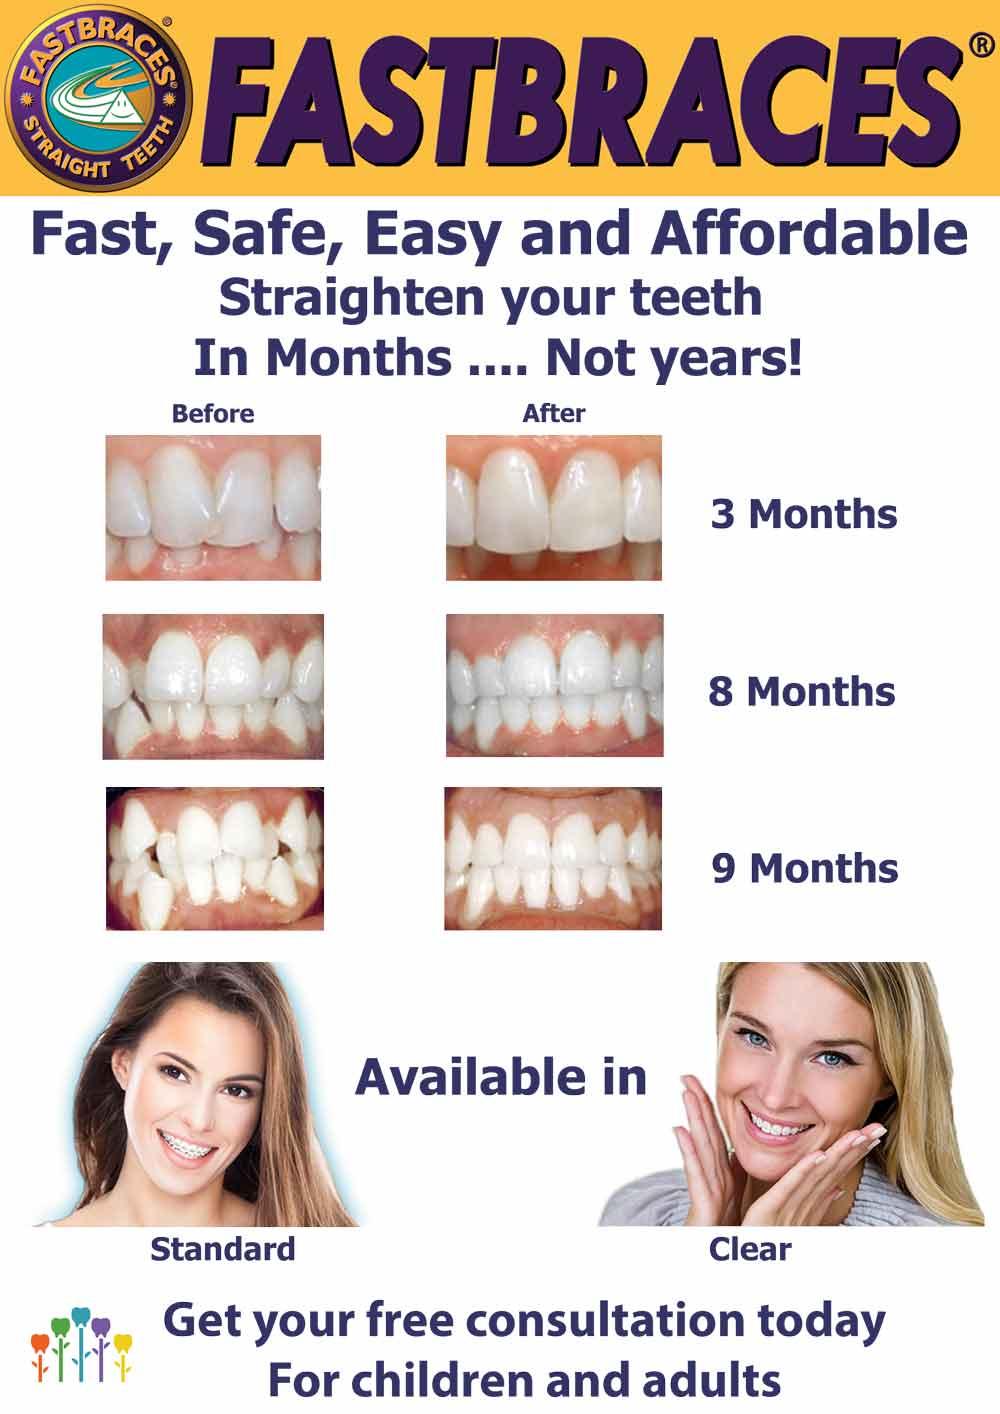 Fastbraces - Straighten Teeth in 120 Days - Smile Place Dental